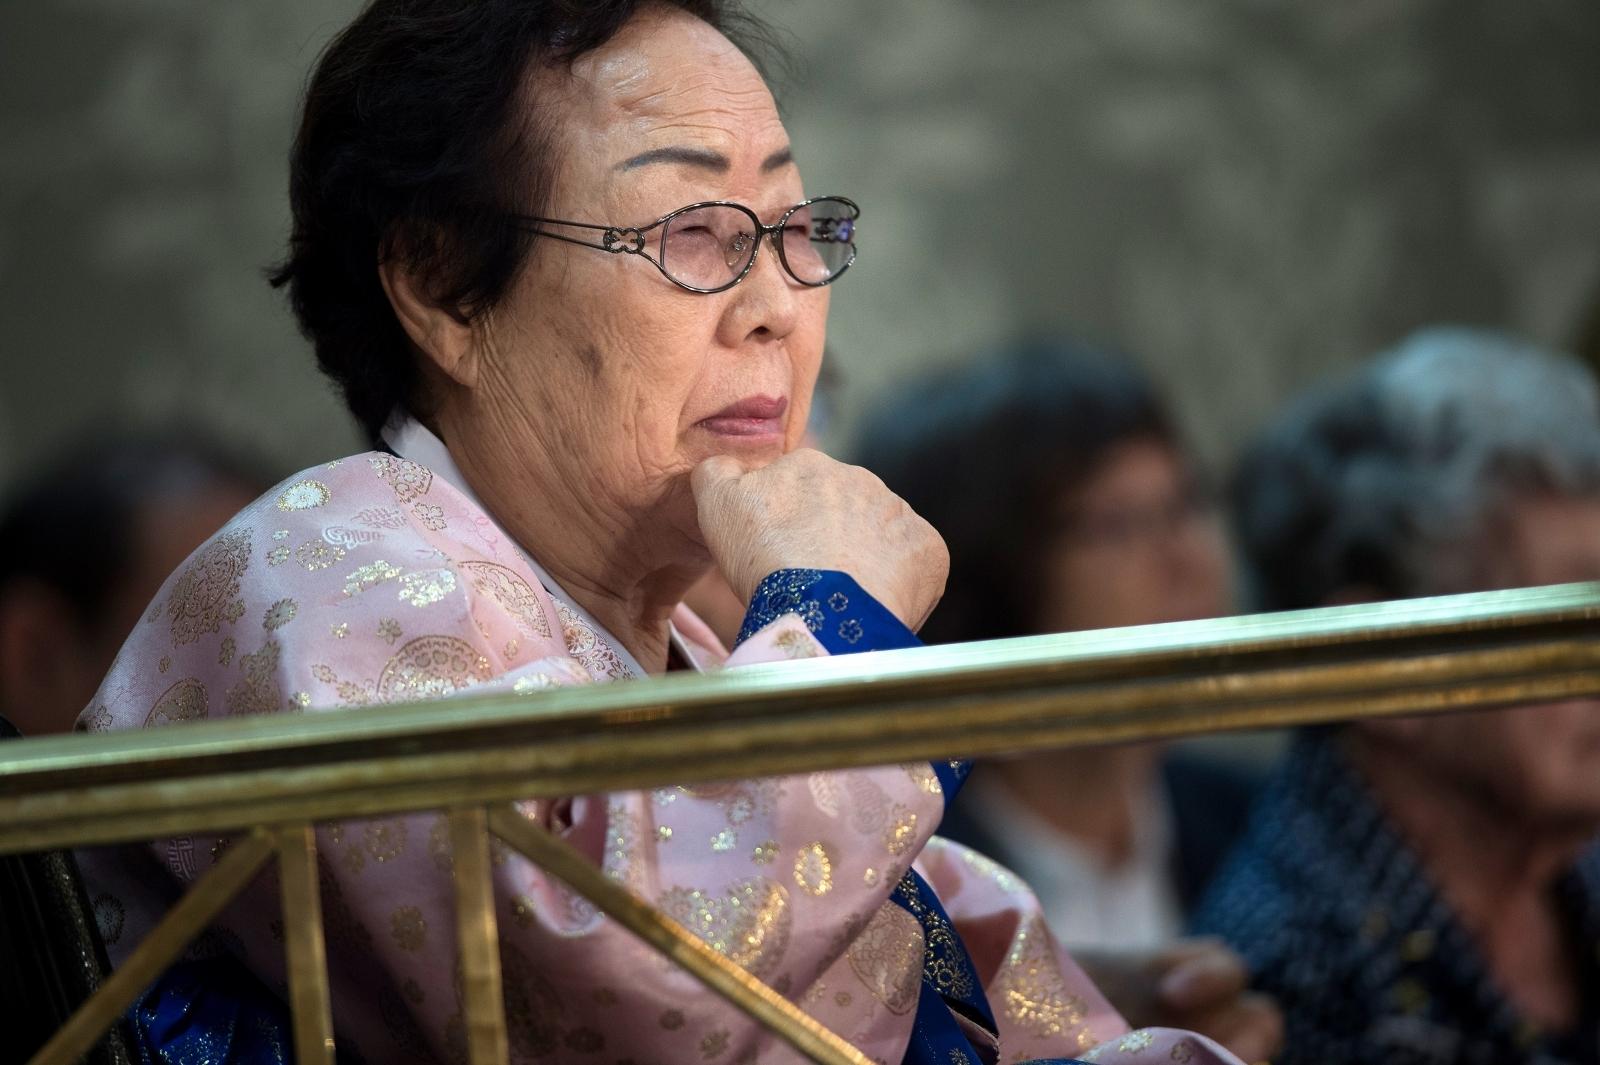 Comfort woman Lee Yong Soo